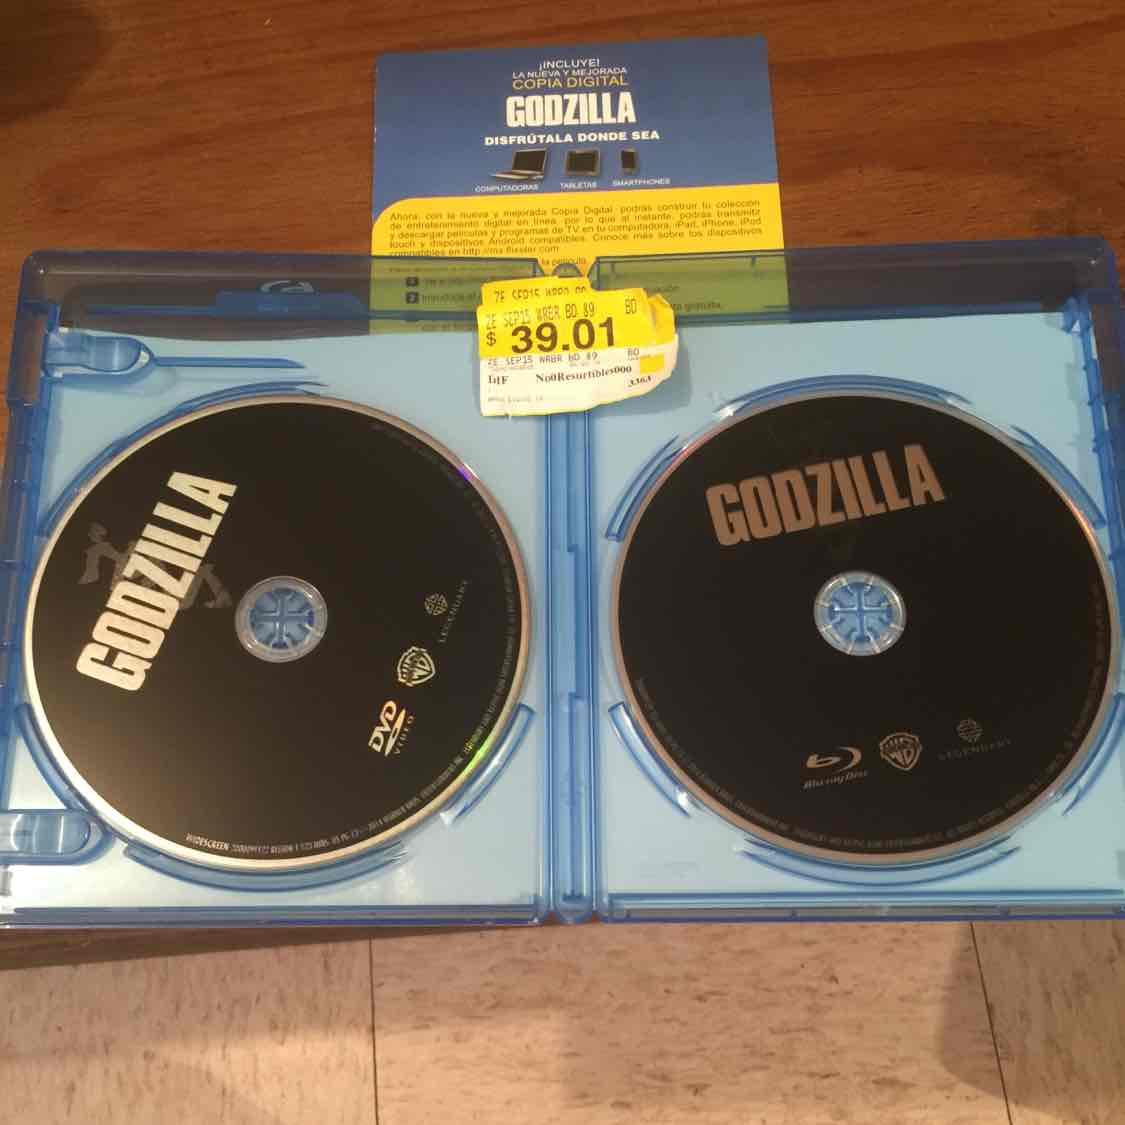 Walmart: película de Godzilla a $39.01